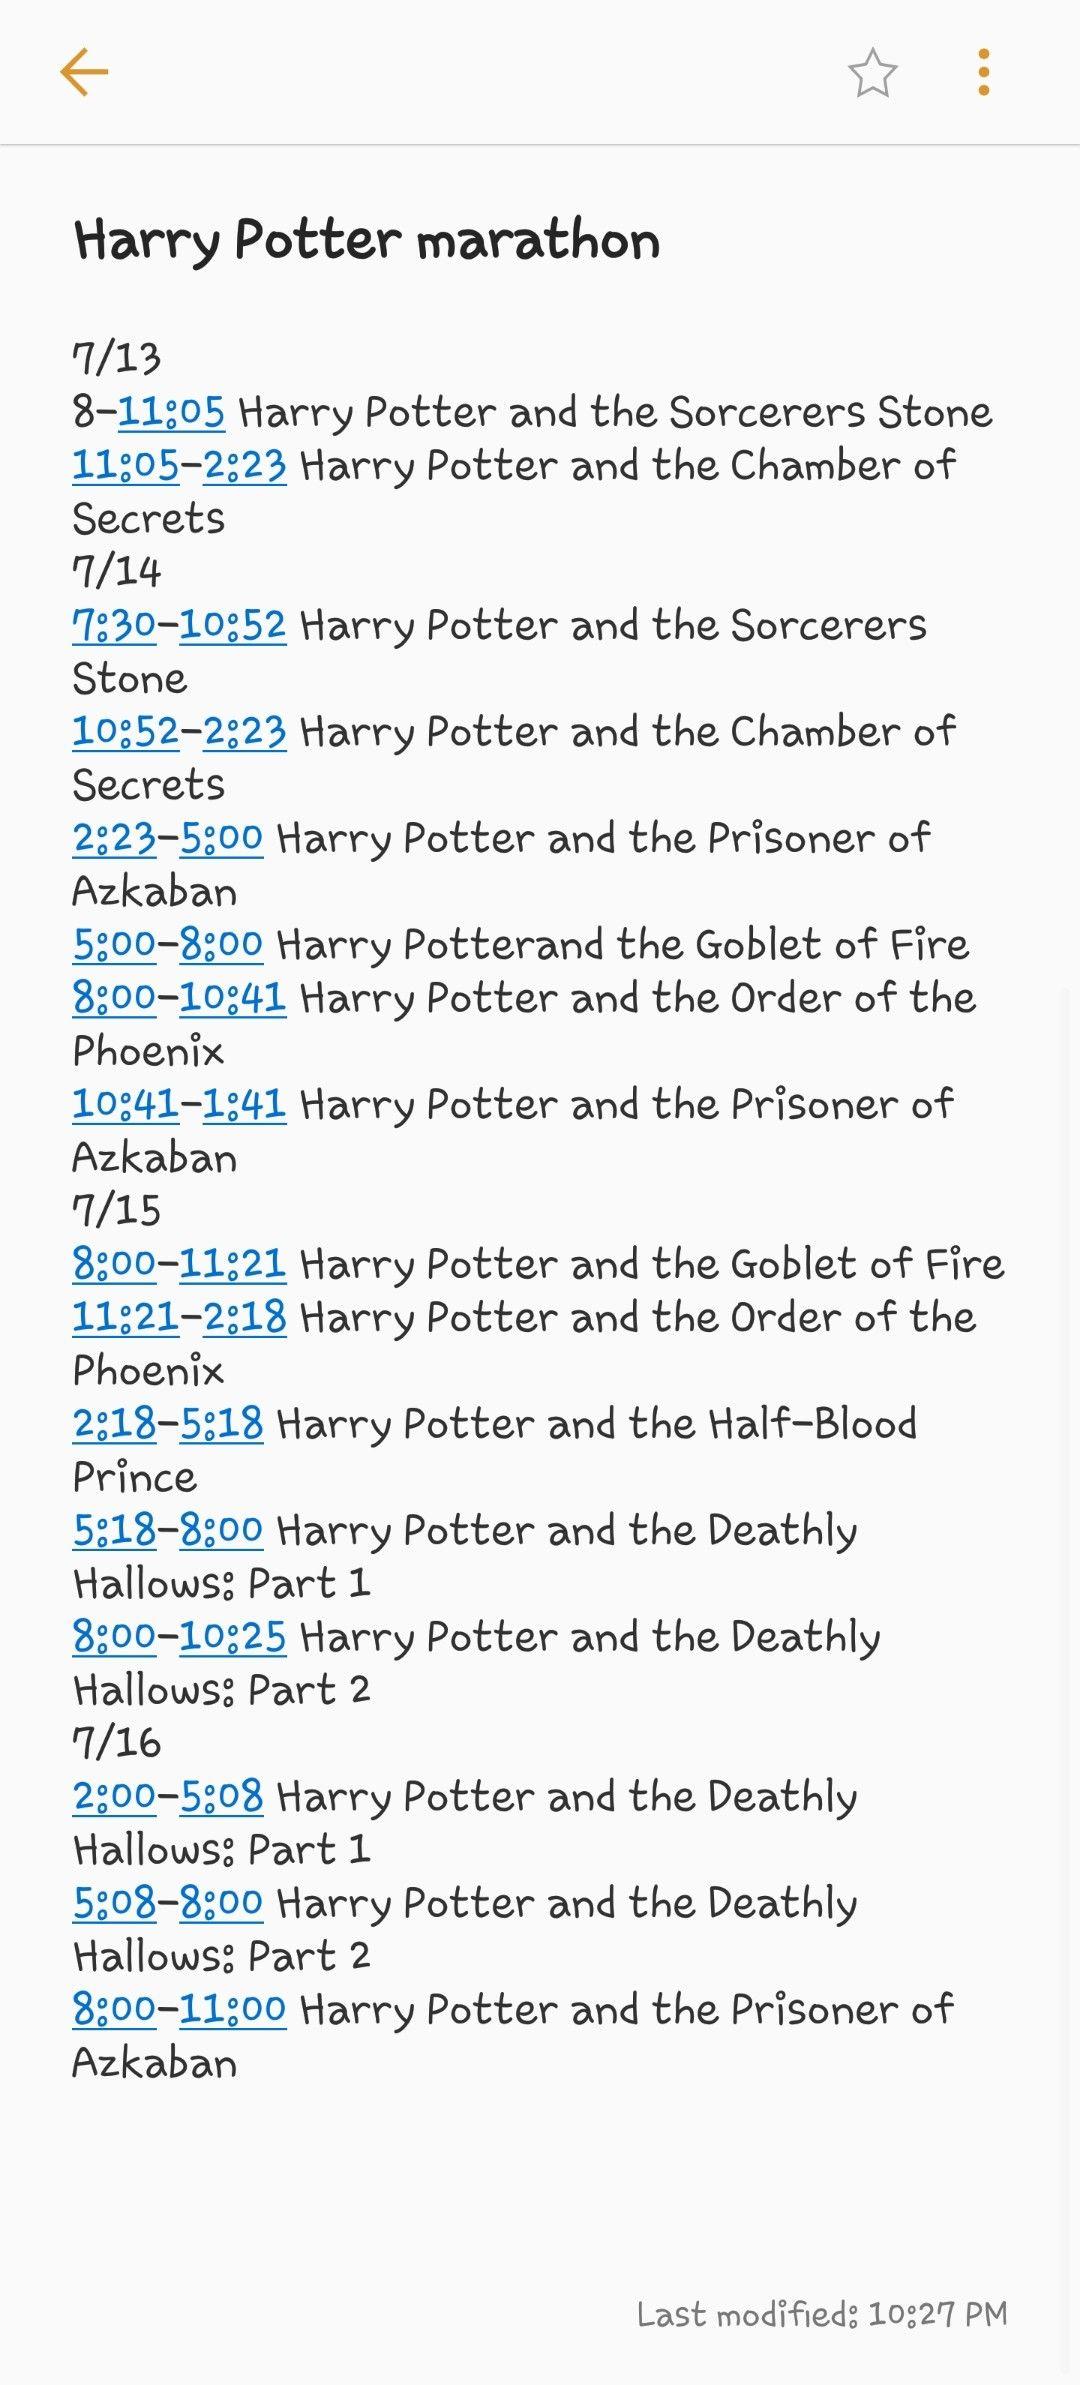 Syfy Harry Potter Wizarding Weekend Marathon Schedule Starting July 13 2018 Harry Potter Marathon Harry Potter Movie Night Harry Potter Movies